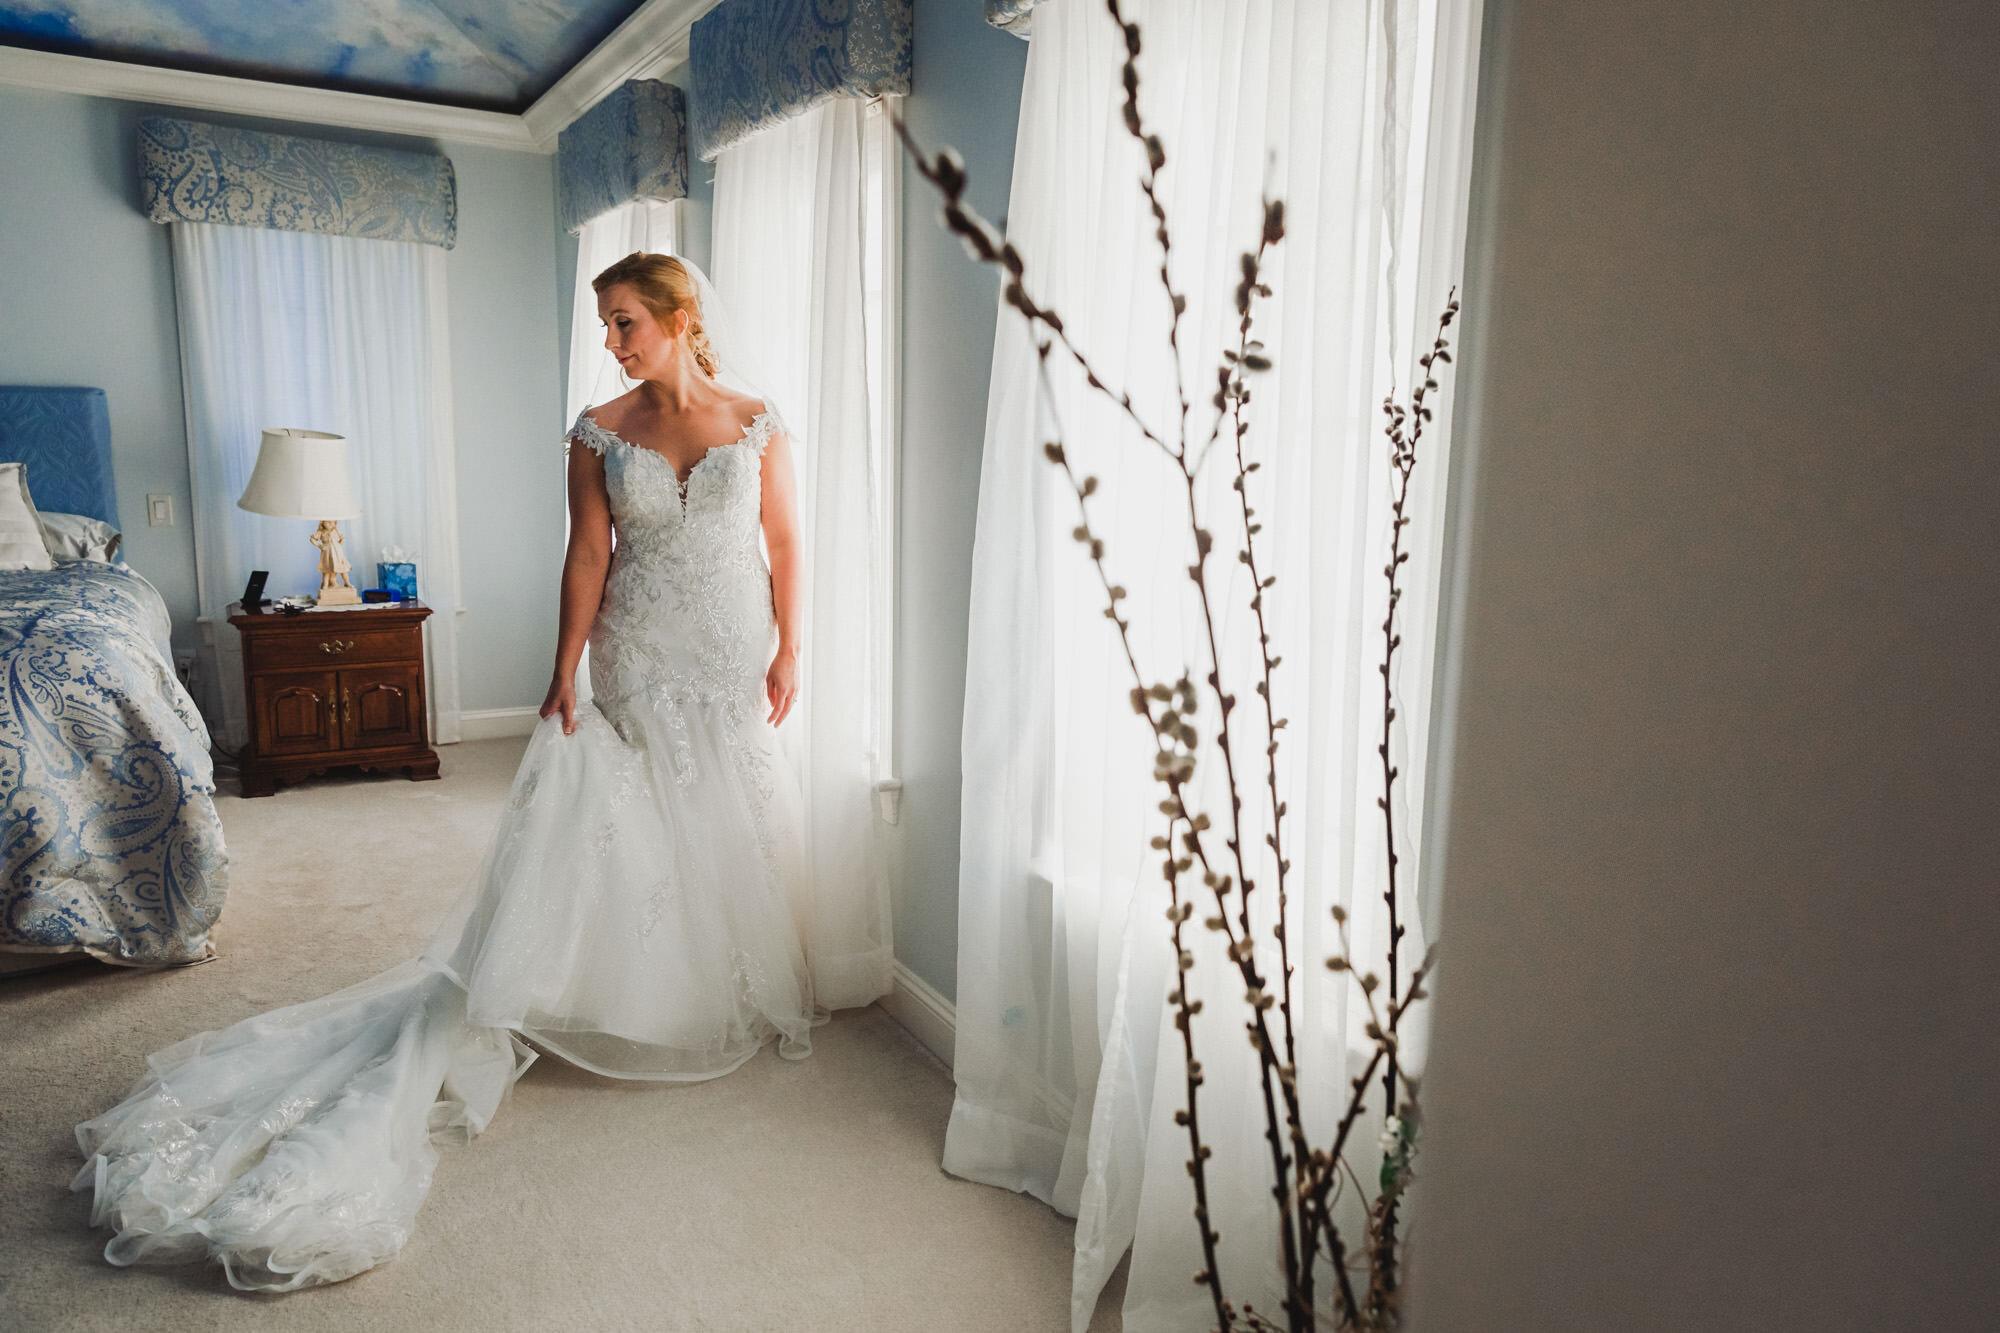 Christina & Dan Wedding at Huntingdon Valley Country Club 00005.JPG